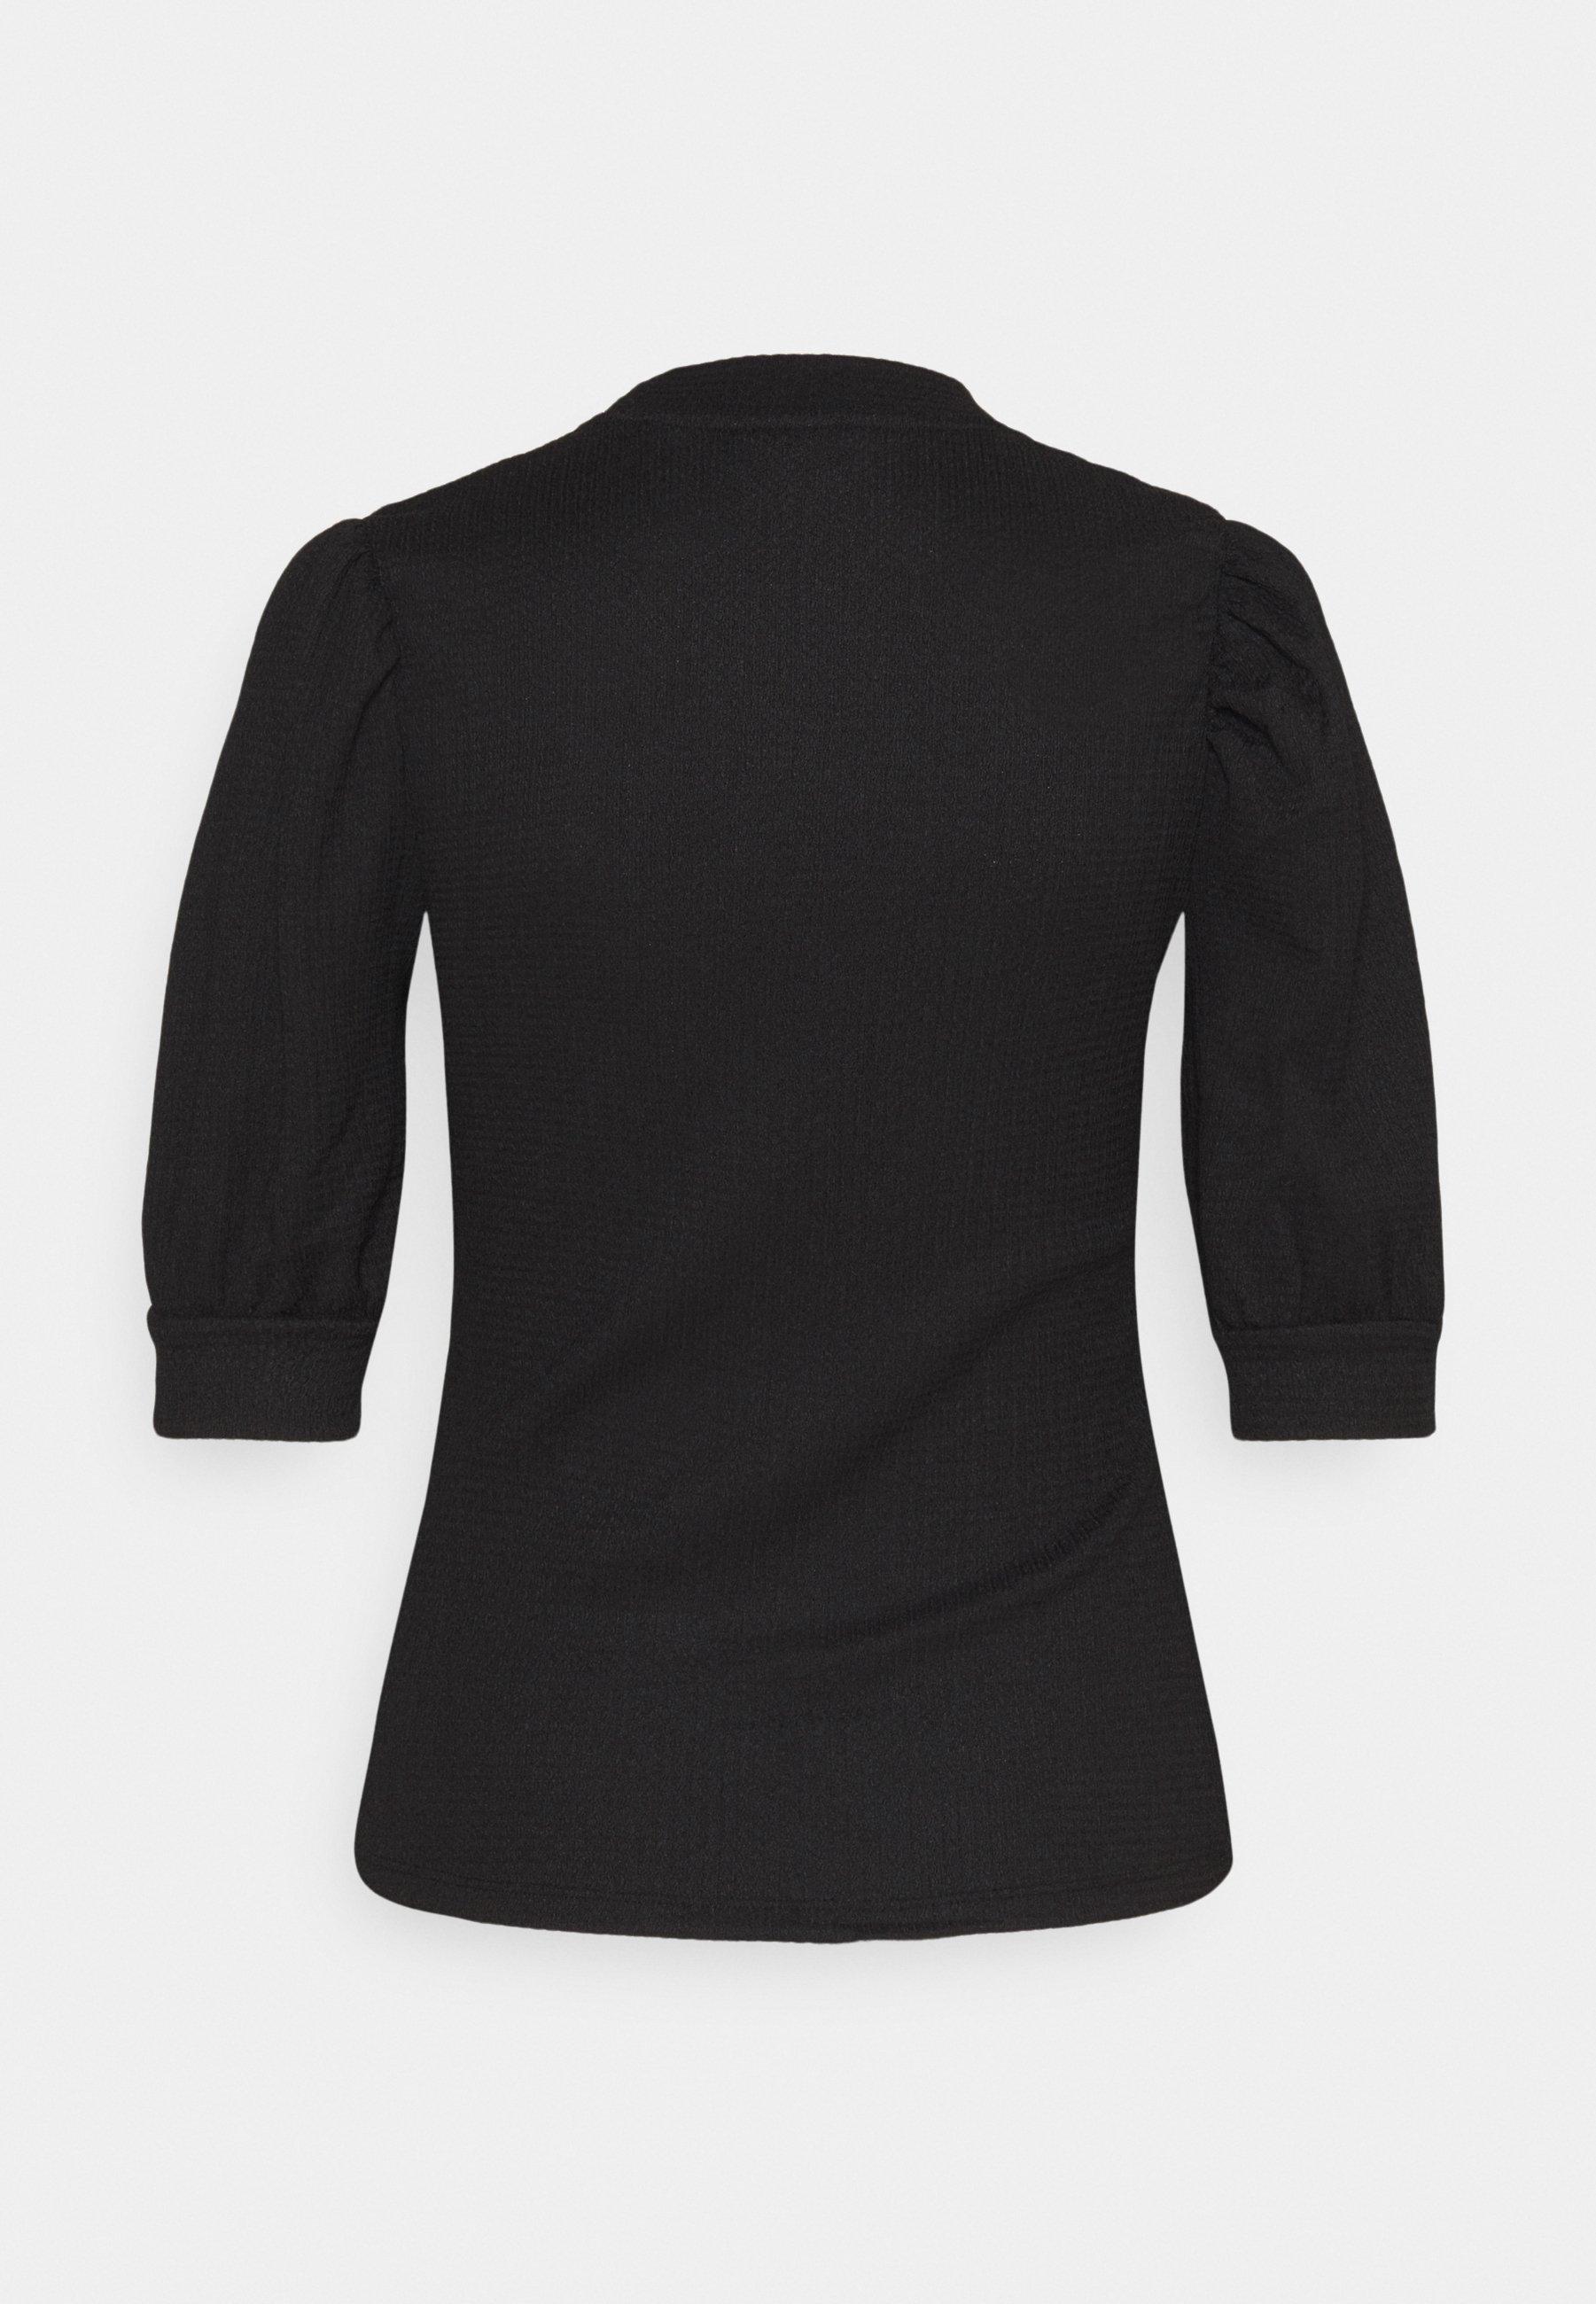 Noisy May Nmjessica Sleeve Puff Top - T-shirts Black/svart